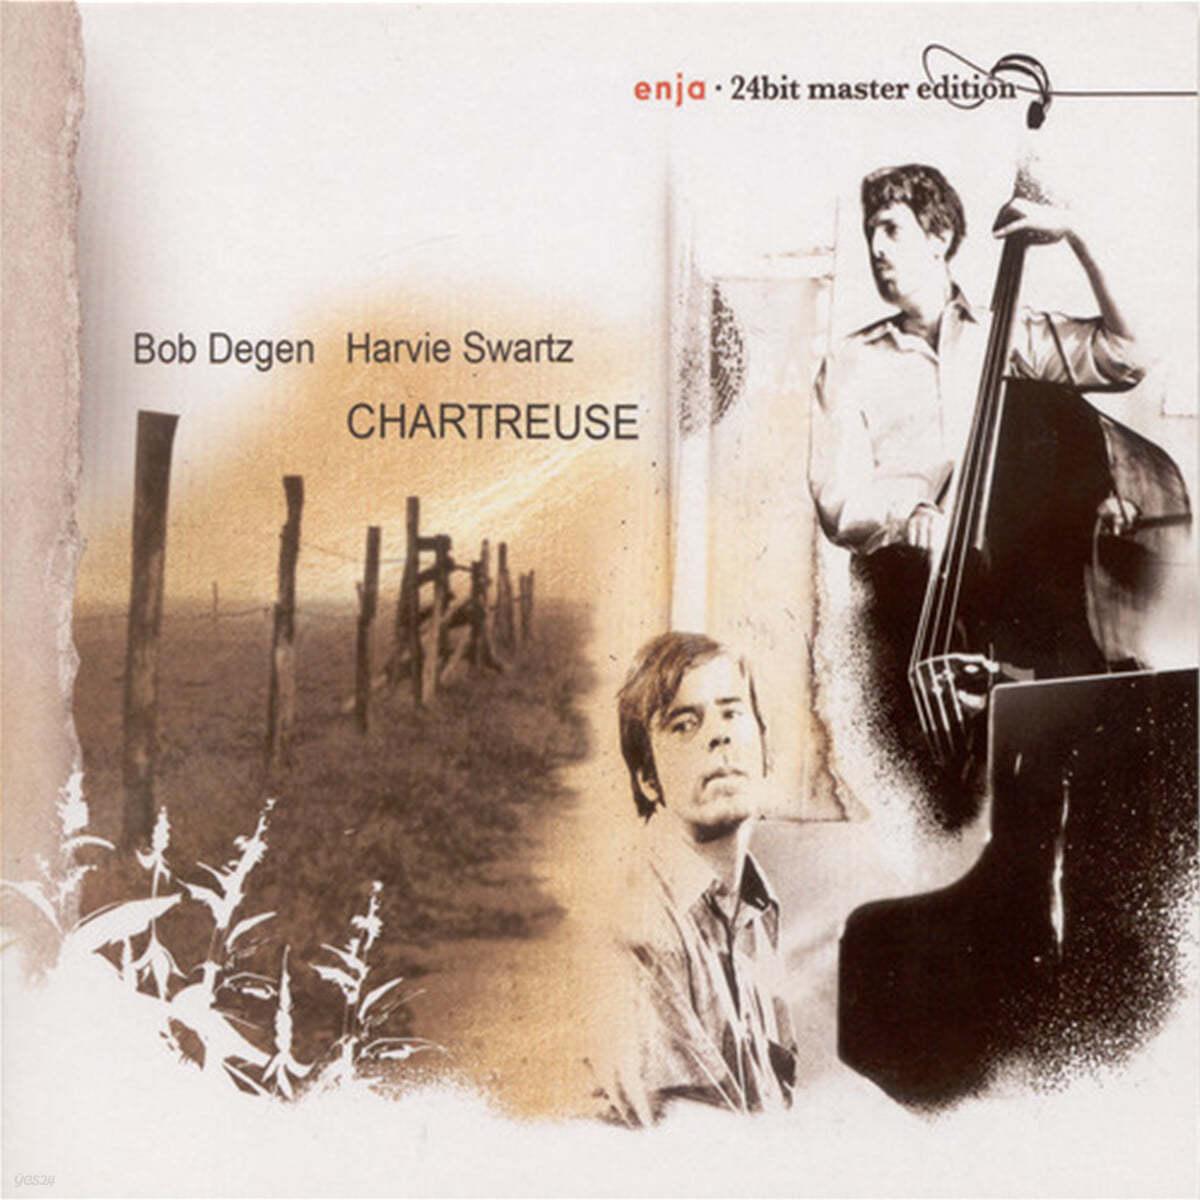 Bob Degen (밥 데겐) - Chartreuse (1977)